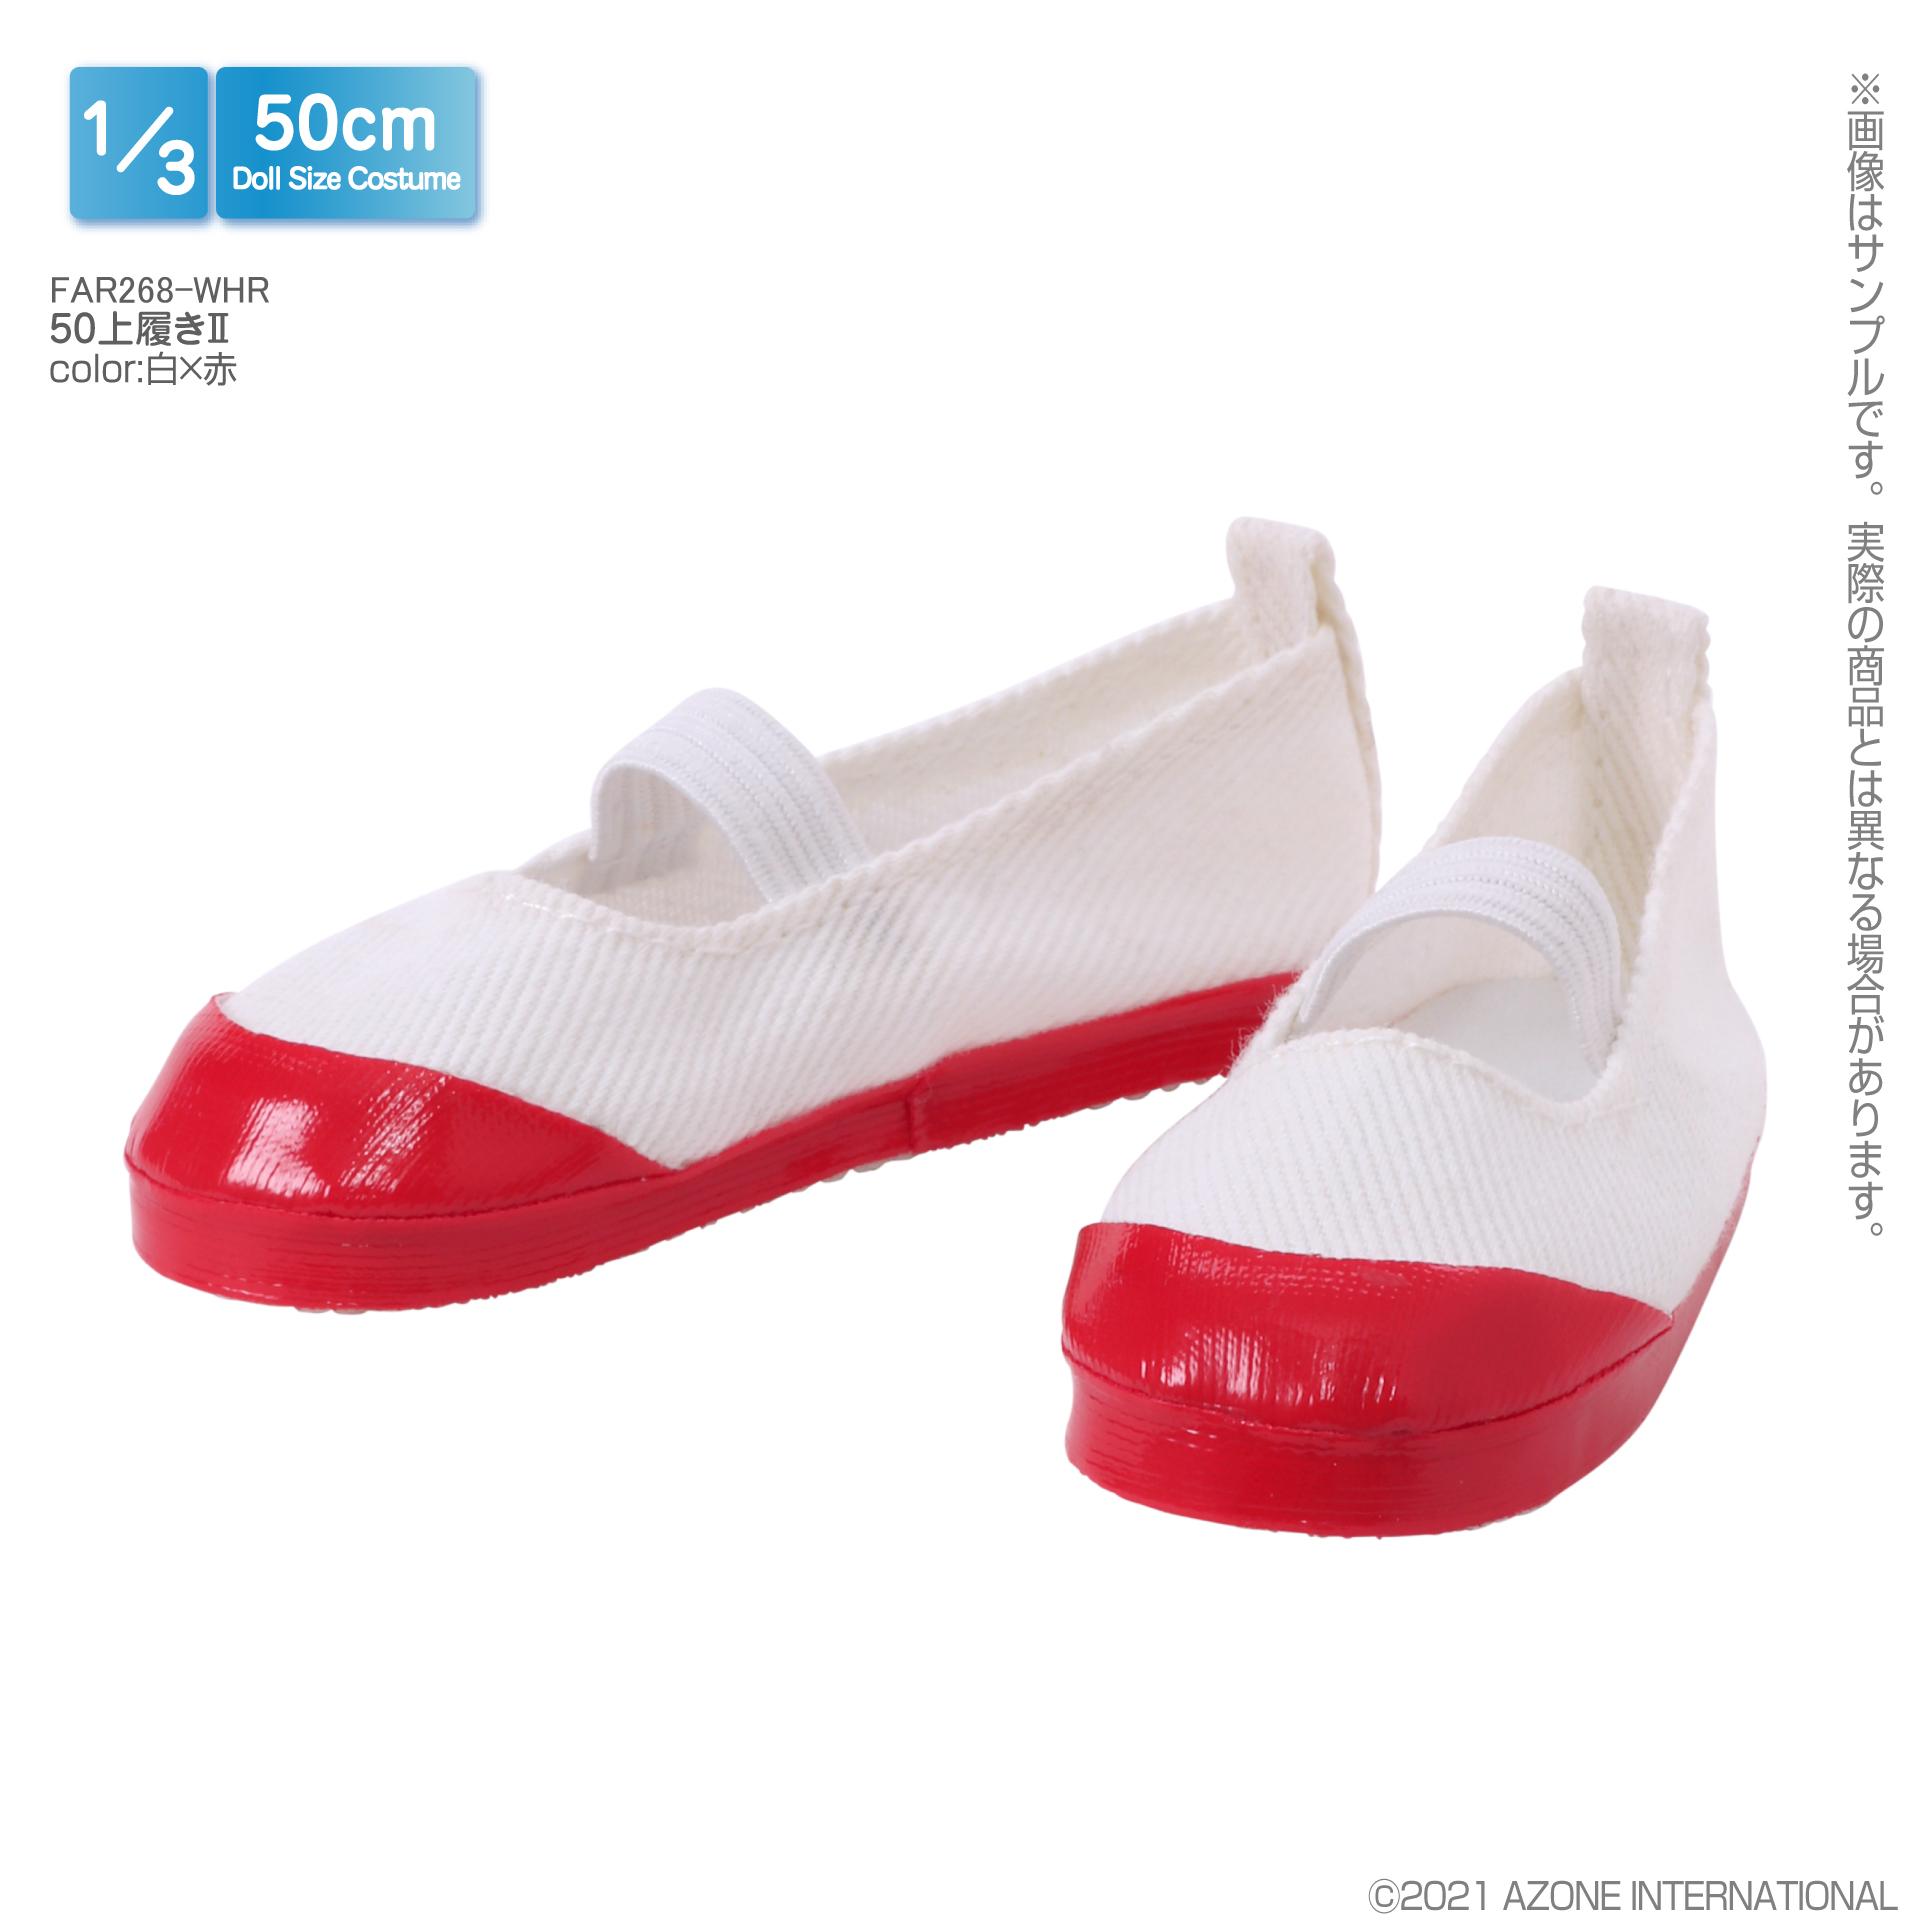 45cmコレクション『45体操着set[エンジ]』1/3 ドール服-007